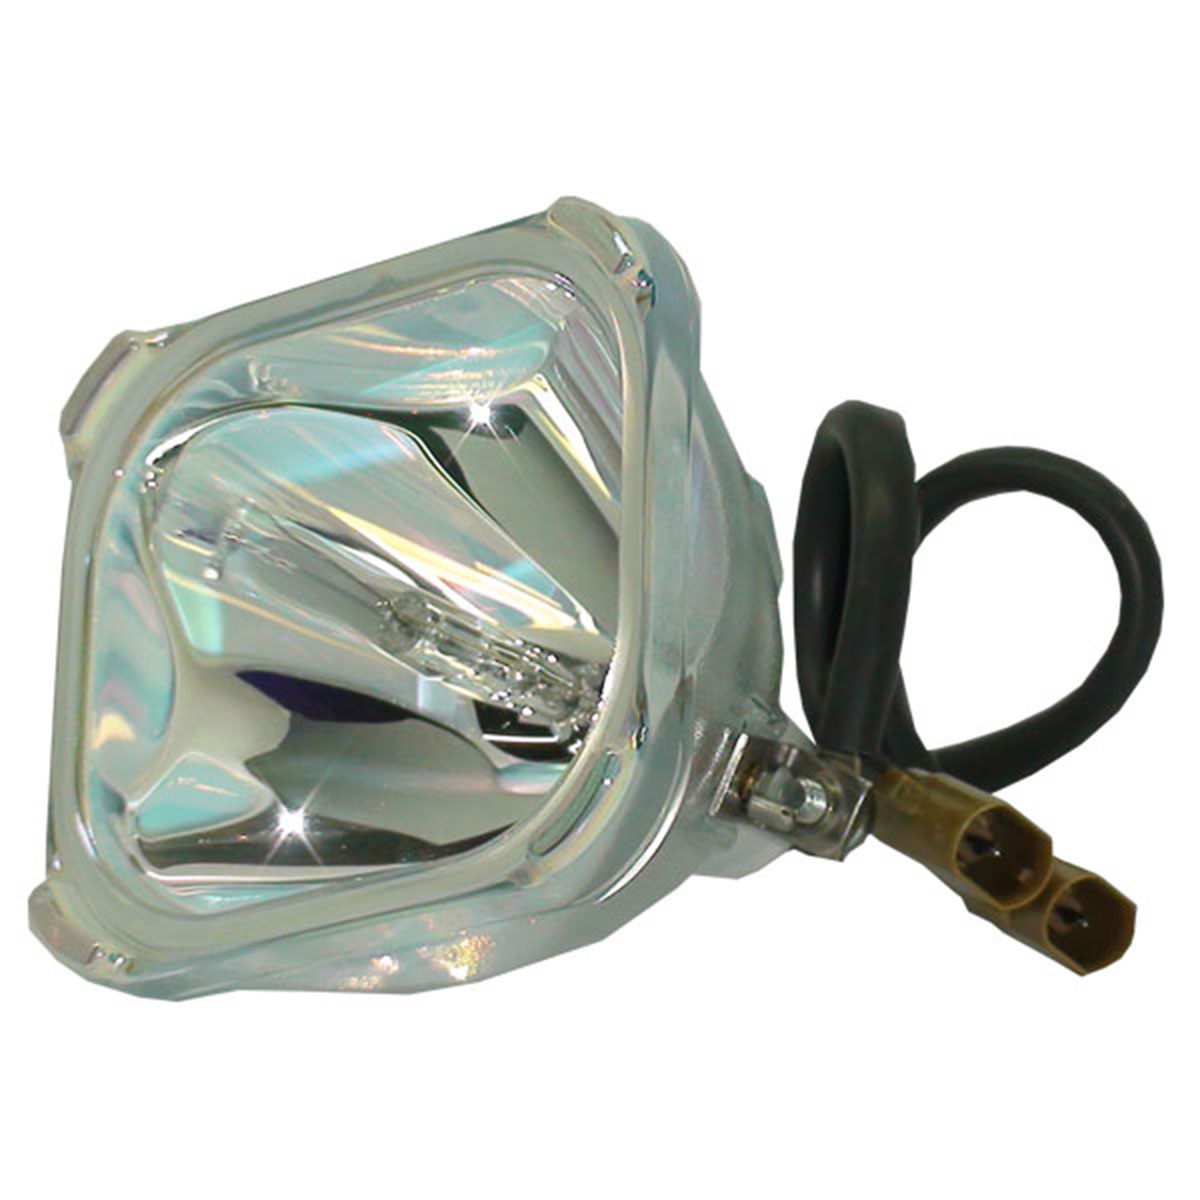 PANASONIC TY-LA1000 TYLA1000 LAMP IN HOUSING FOR MODEL PT44LCX65